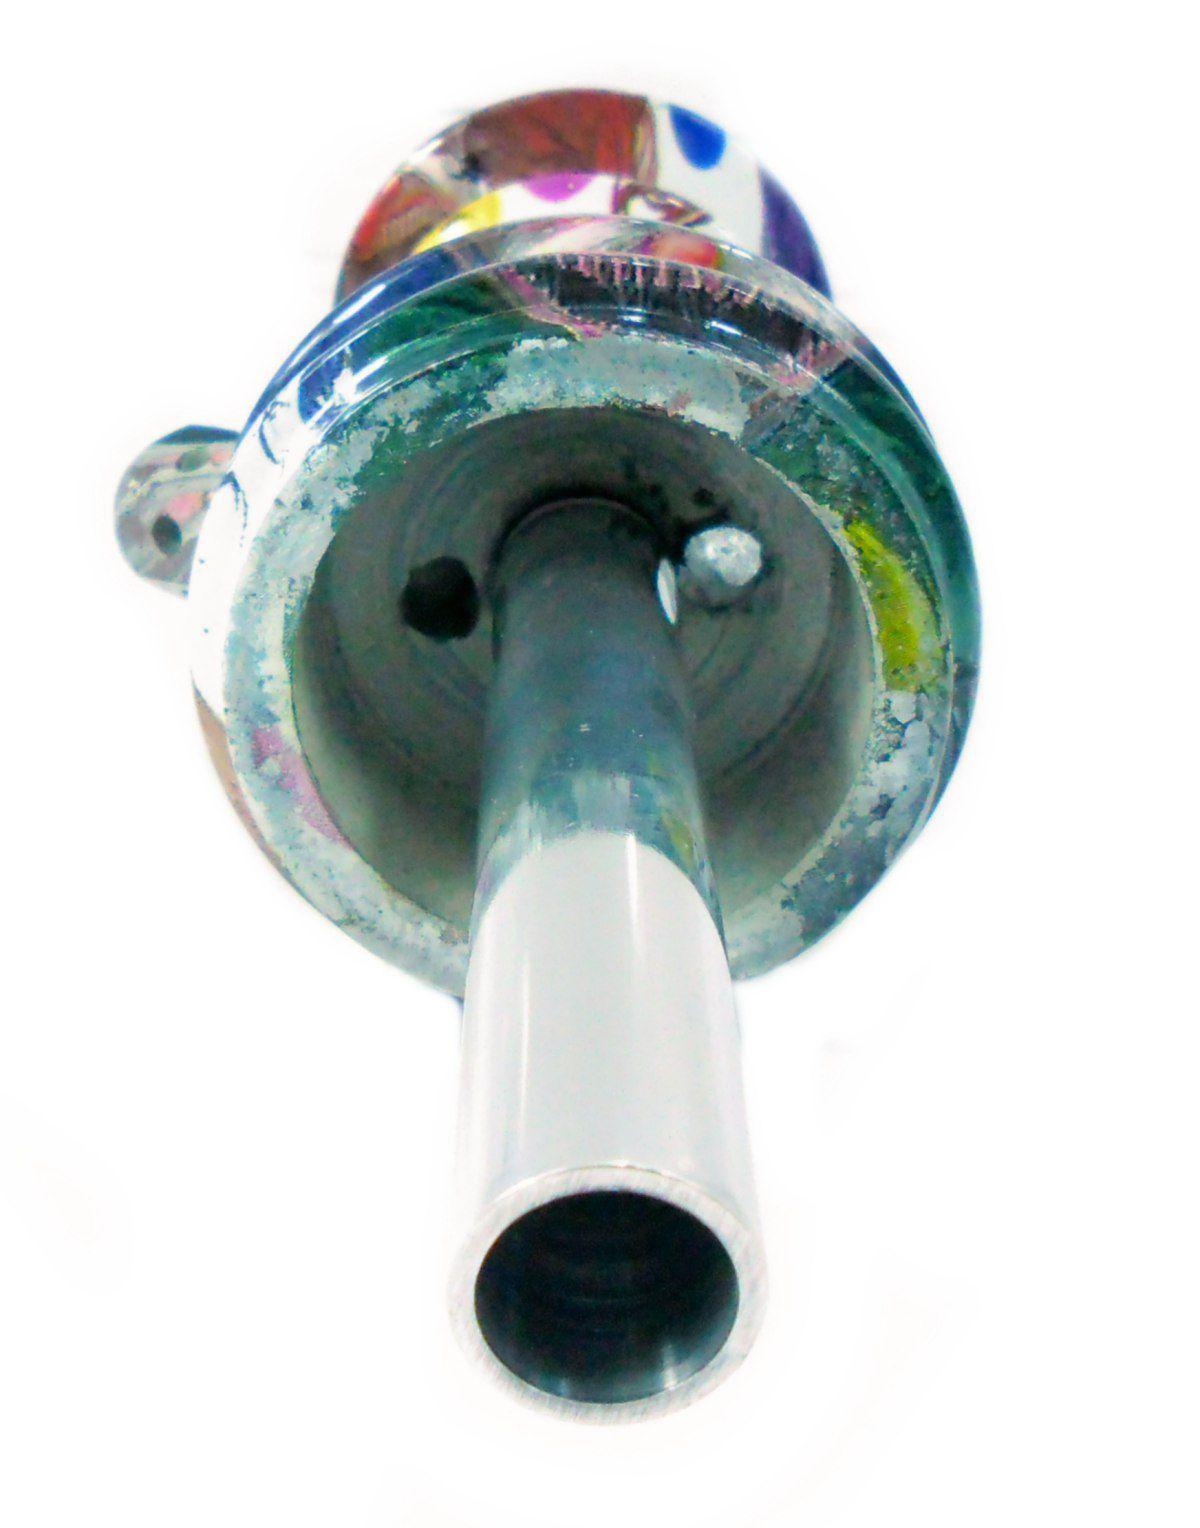 Stem (corpo de narguile) JUDITH PALHAÇO MACABRO 22cm, alumínio usinado, dutado, pintura hidrográfica